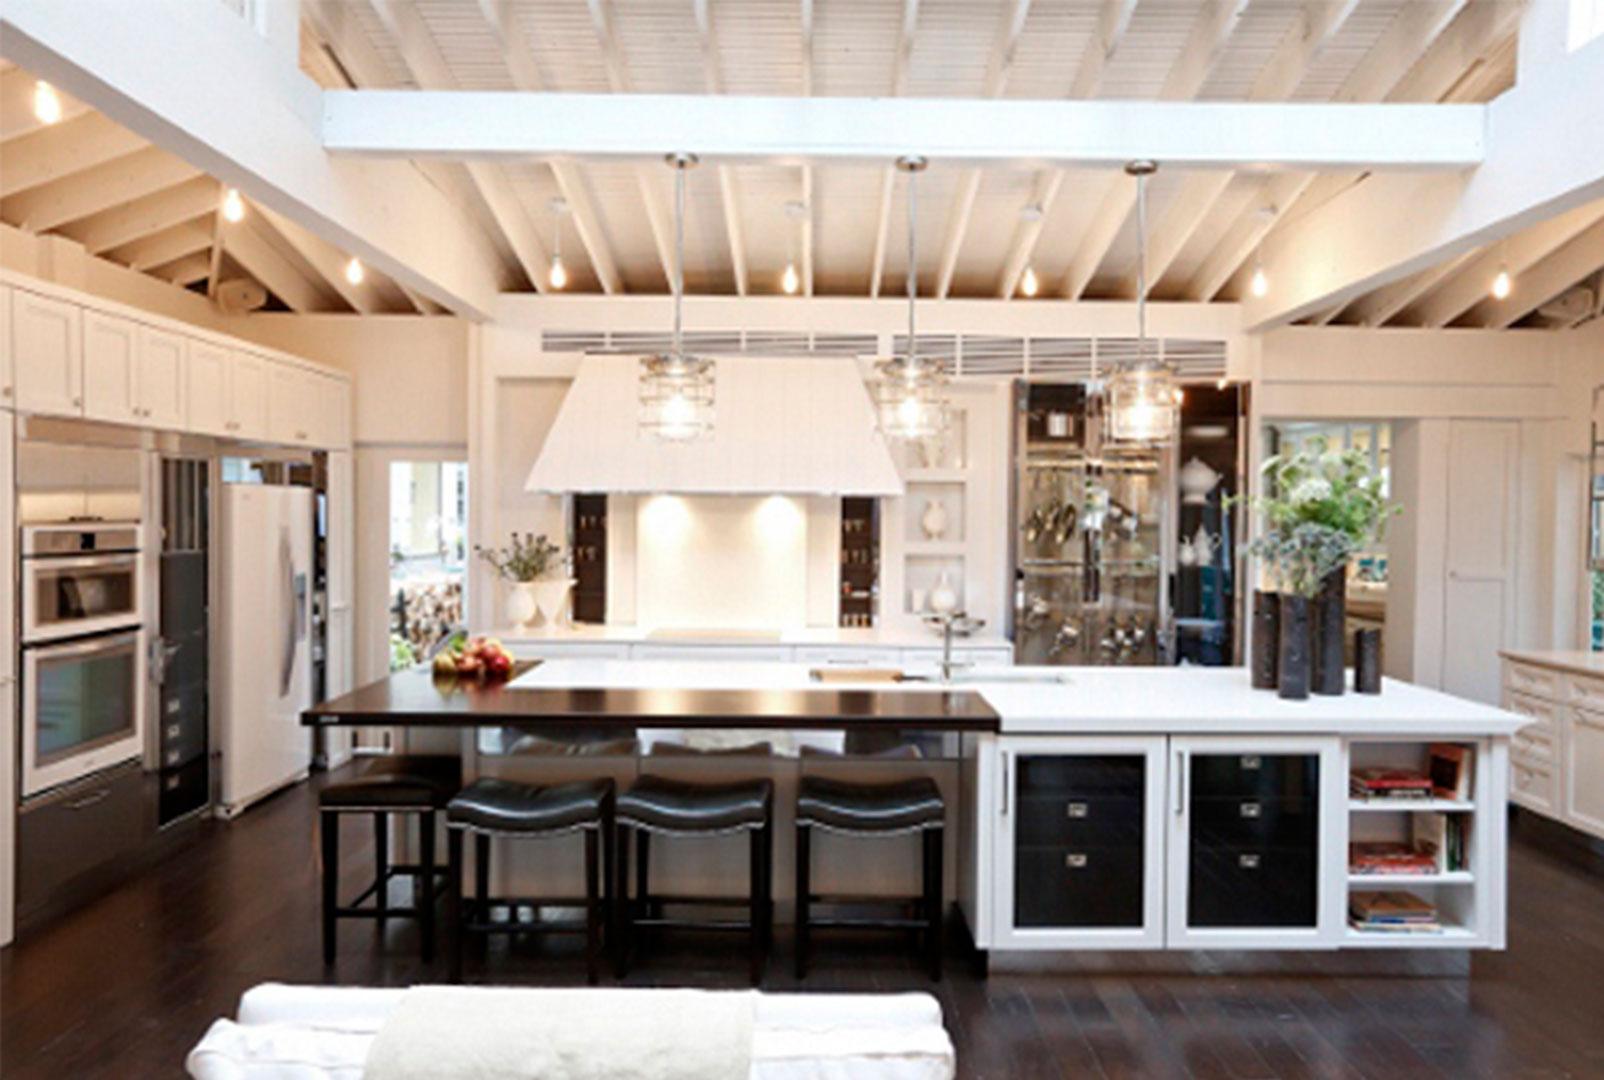 kitchen design ideas 2014 laminate table تشكيلة مطابخ مدهشة المرسال